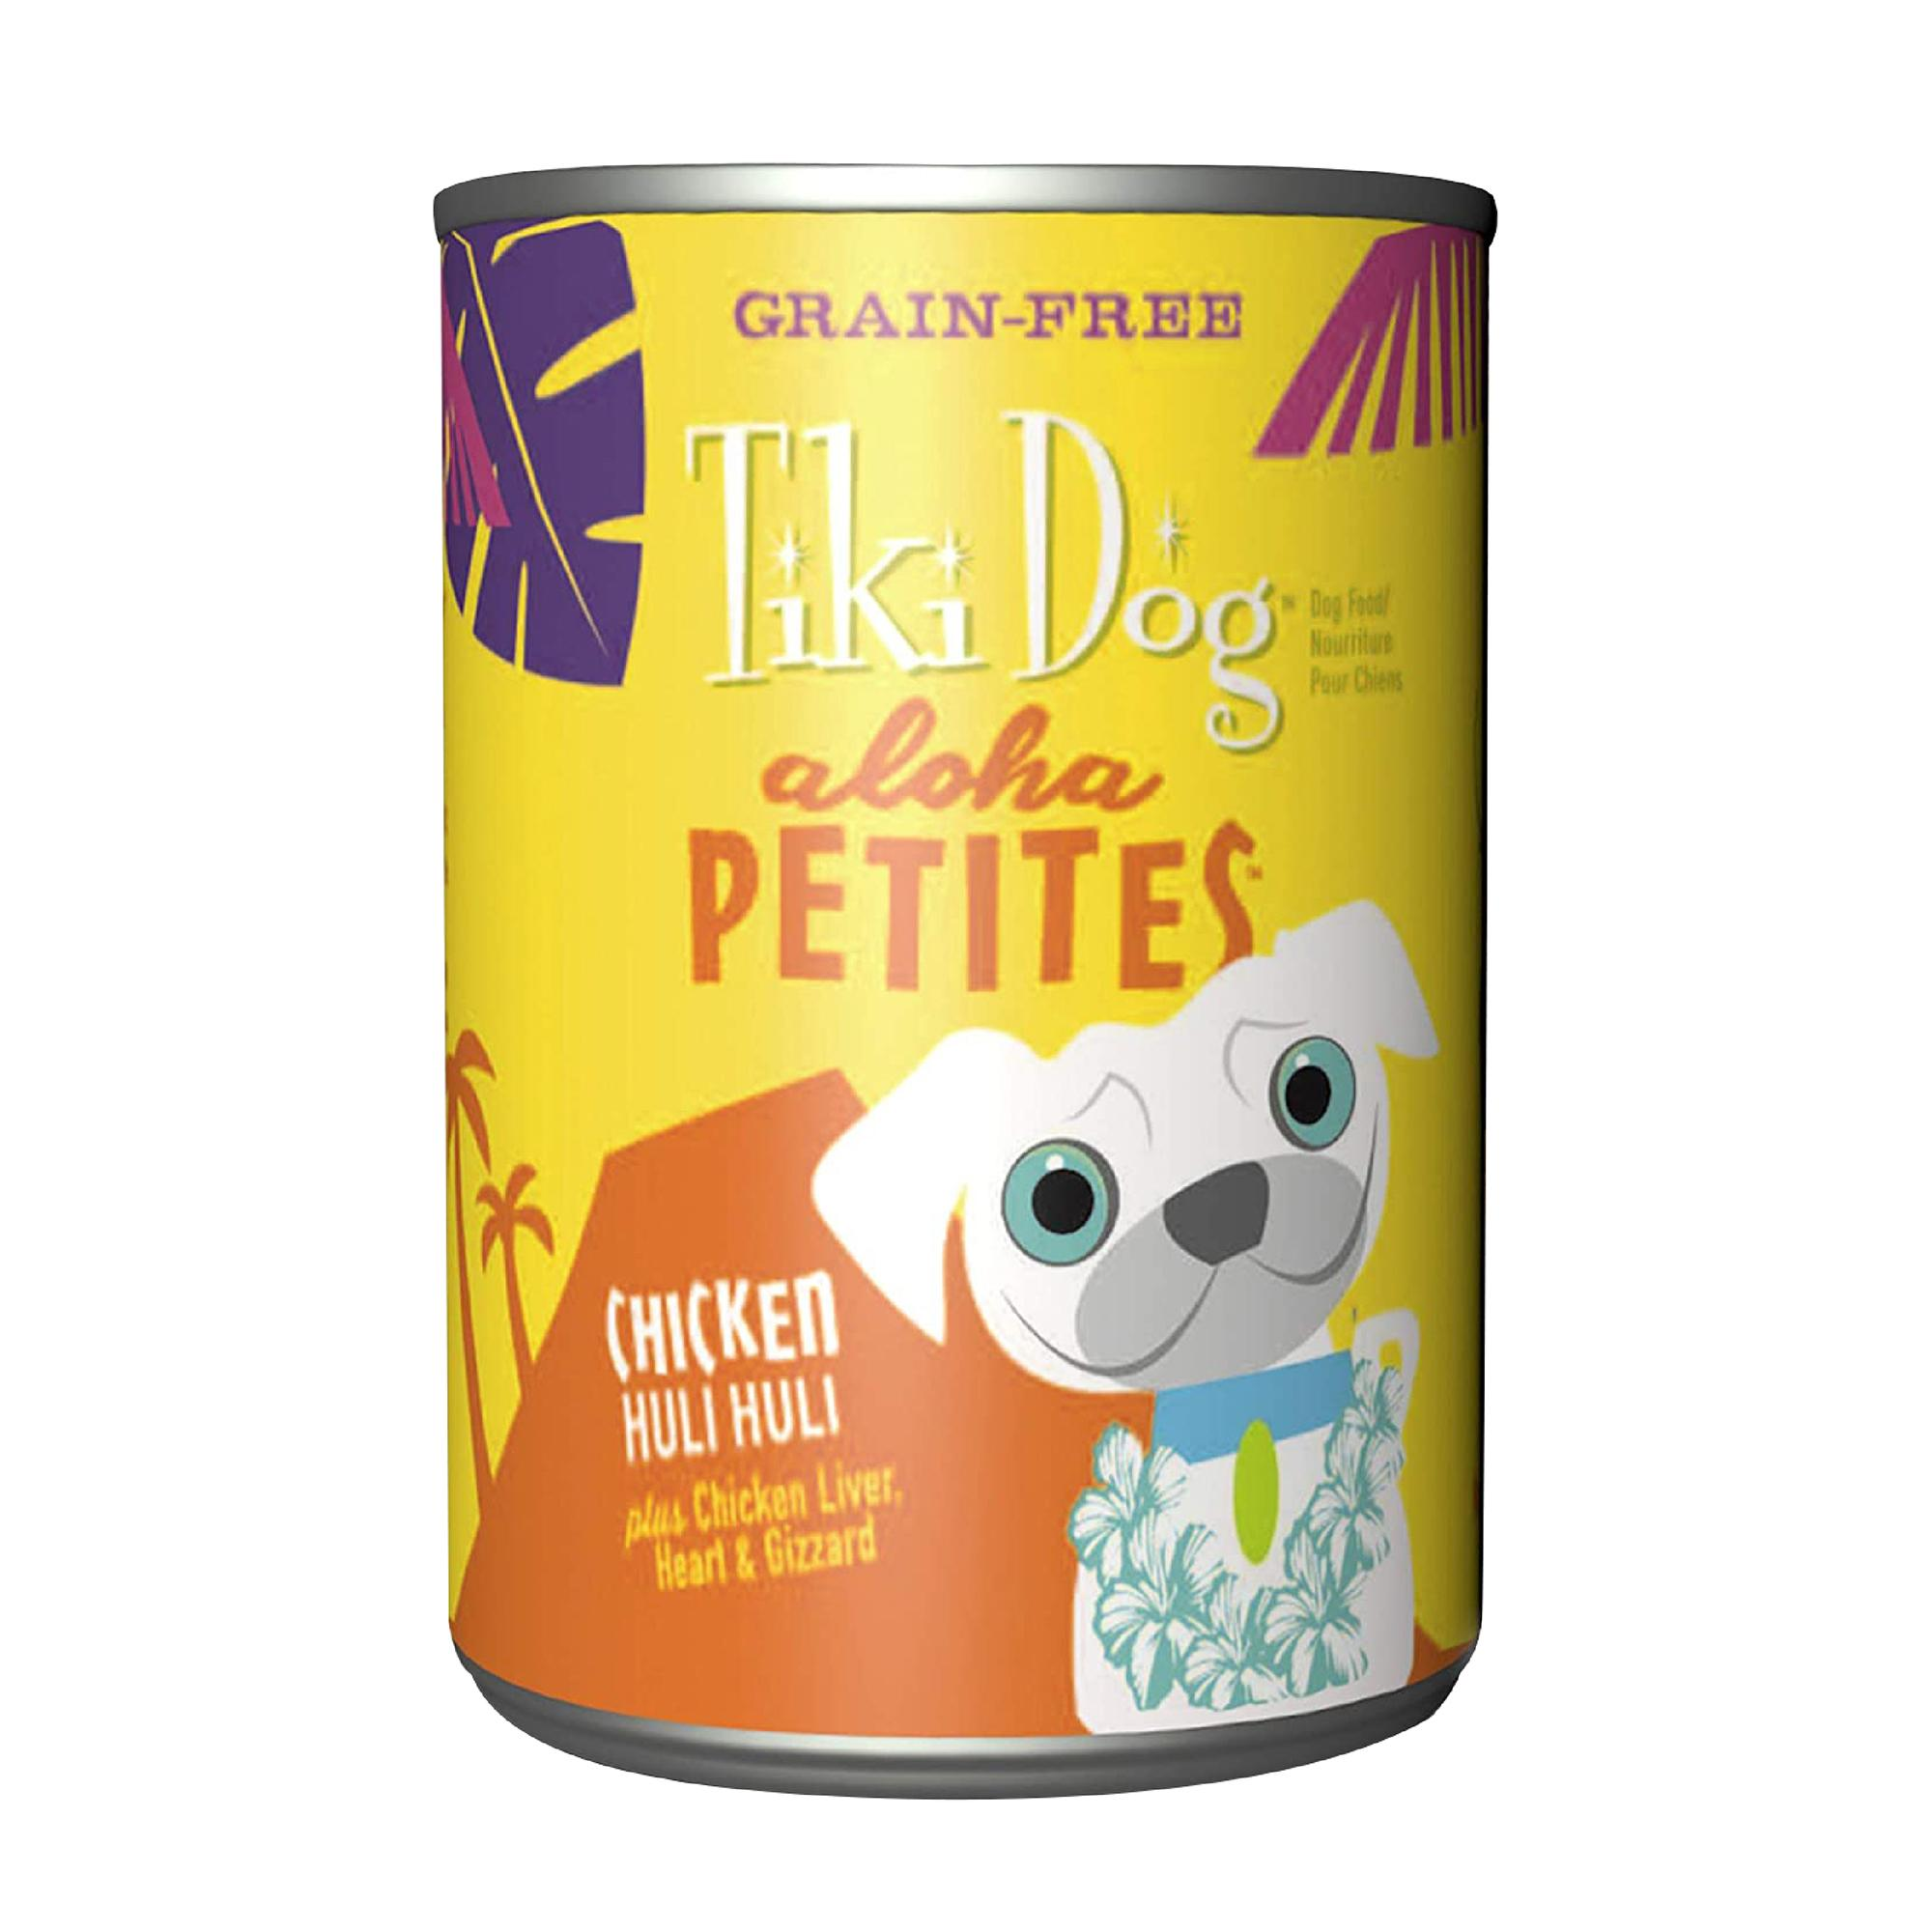 Tiki Dog Aloha Petites Chicken Huli Huli Wet Dog Food, 9-oz can, case of 8